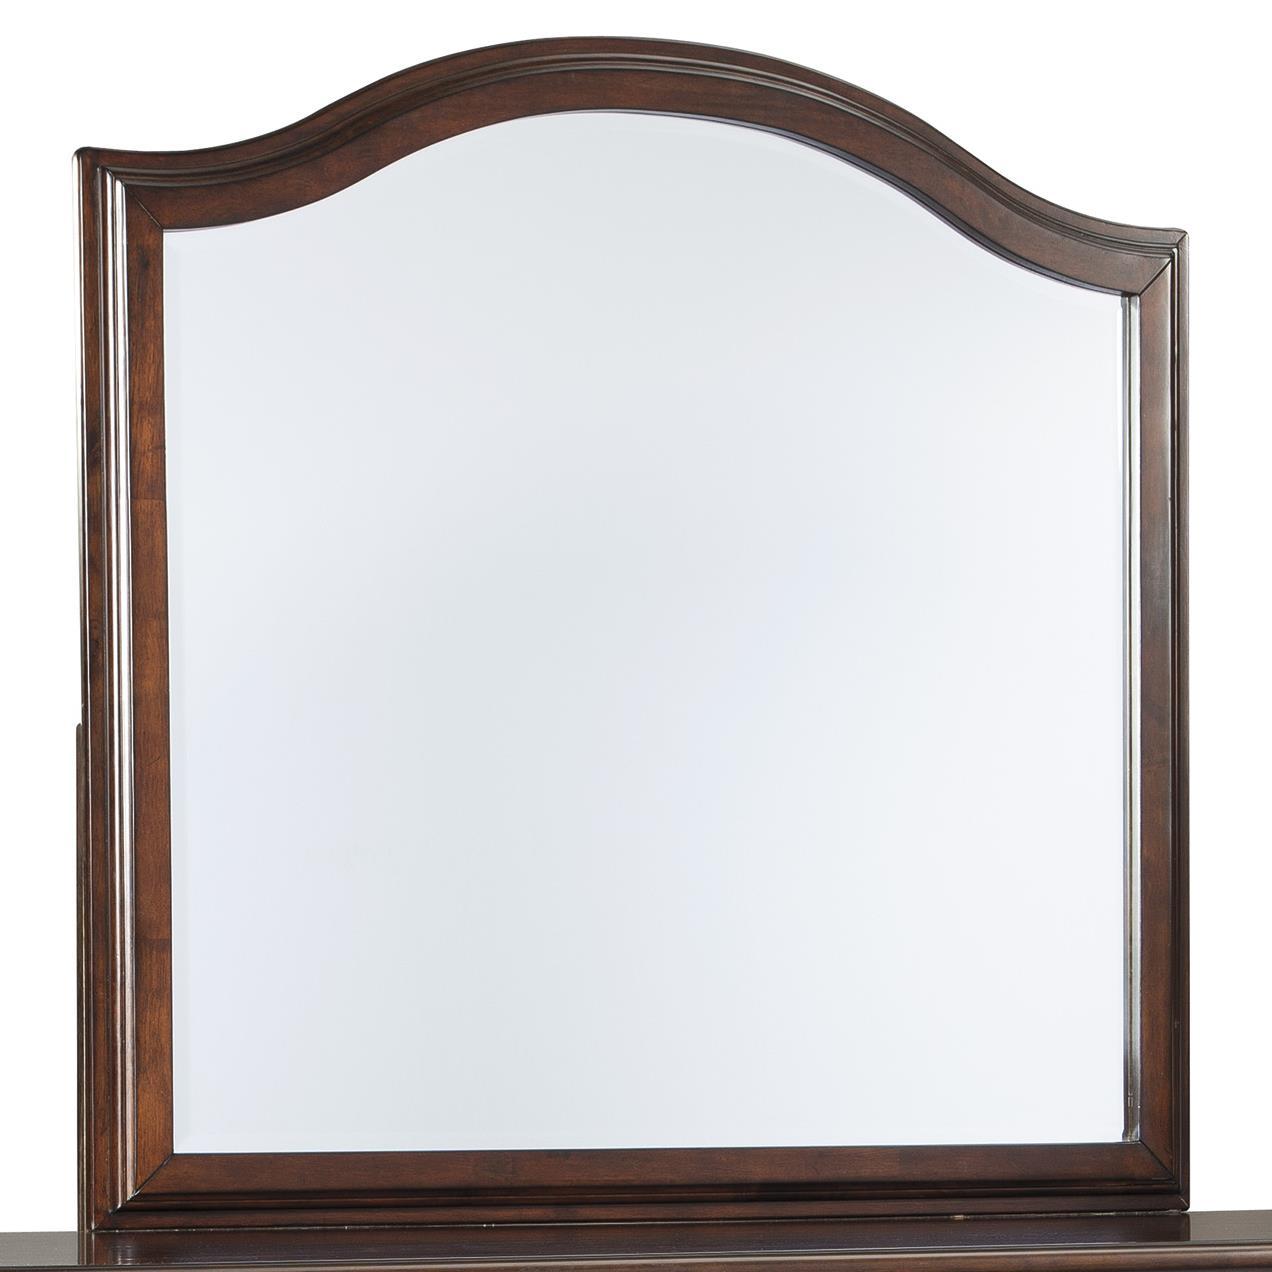 Signature Design by Ashley Brulind Bedroom Mirror - Item Number: B554-36